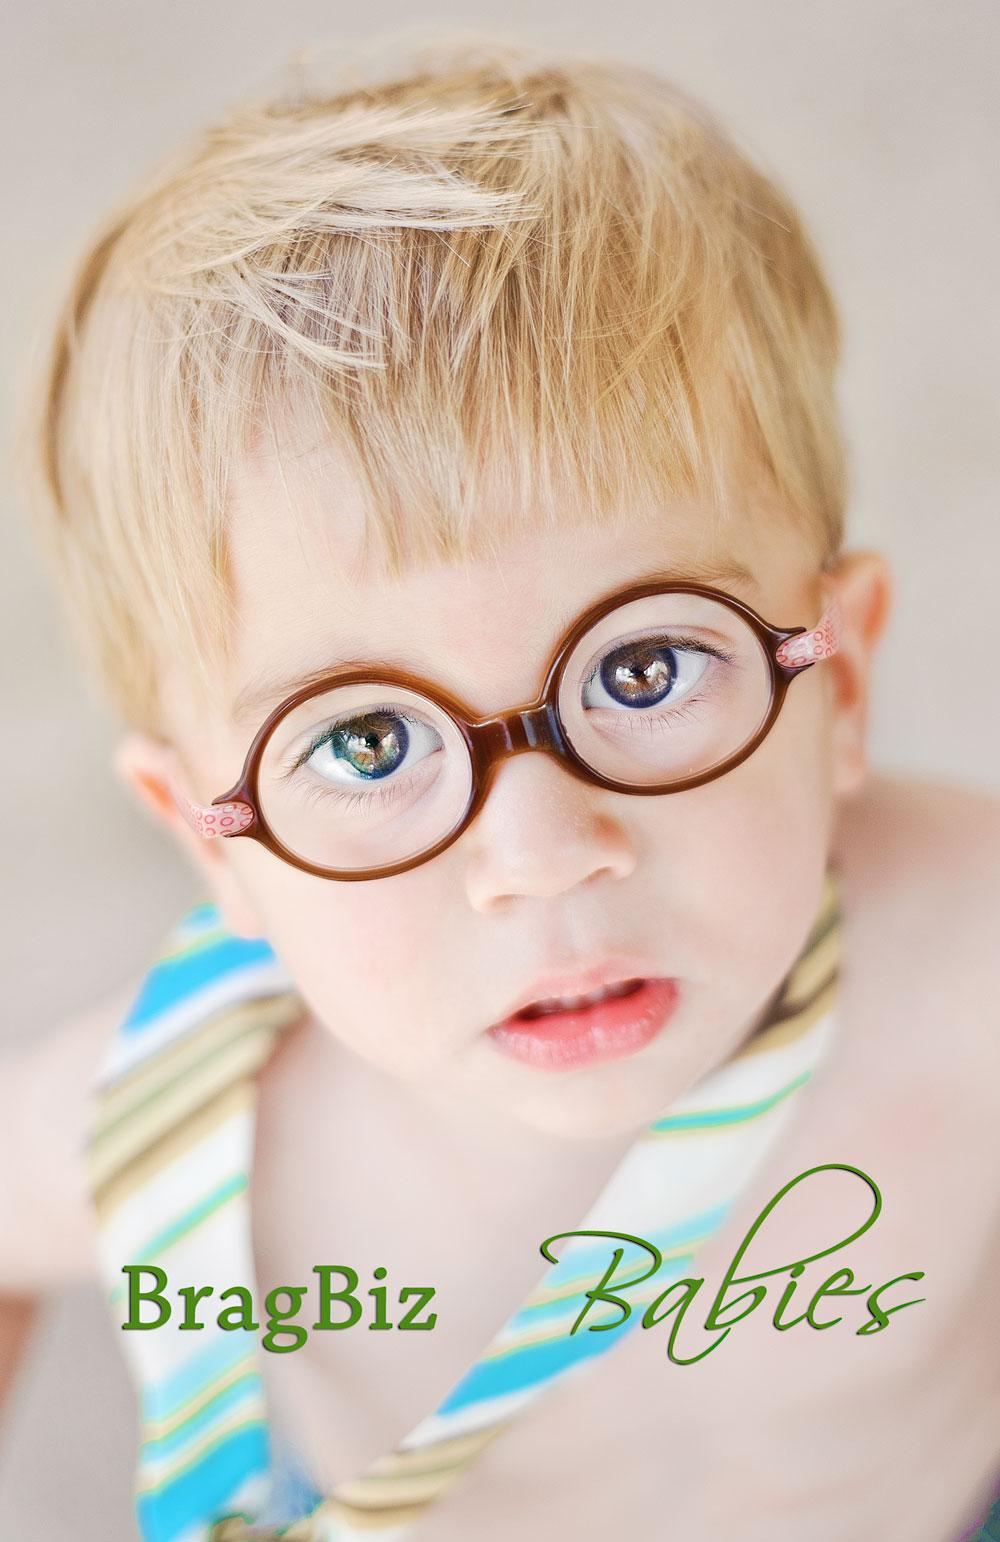 austin-area-baby-photographer-bragbiz-lindy-mowery